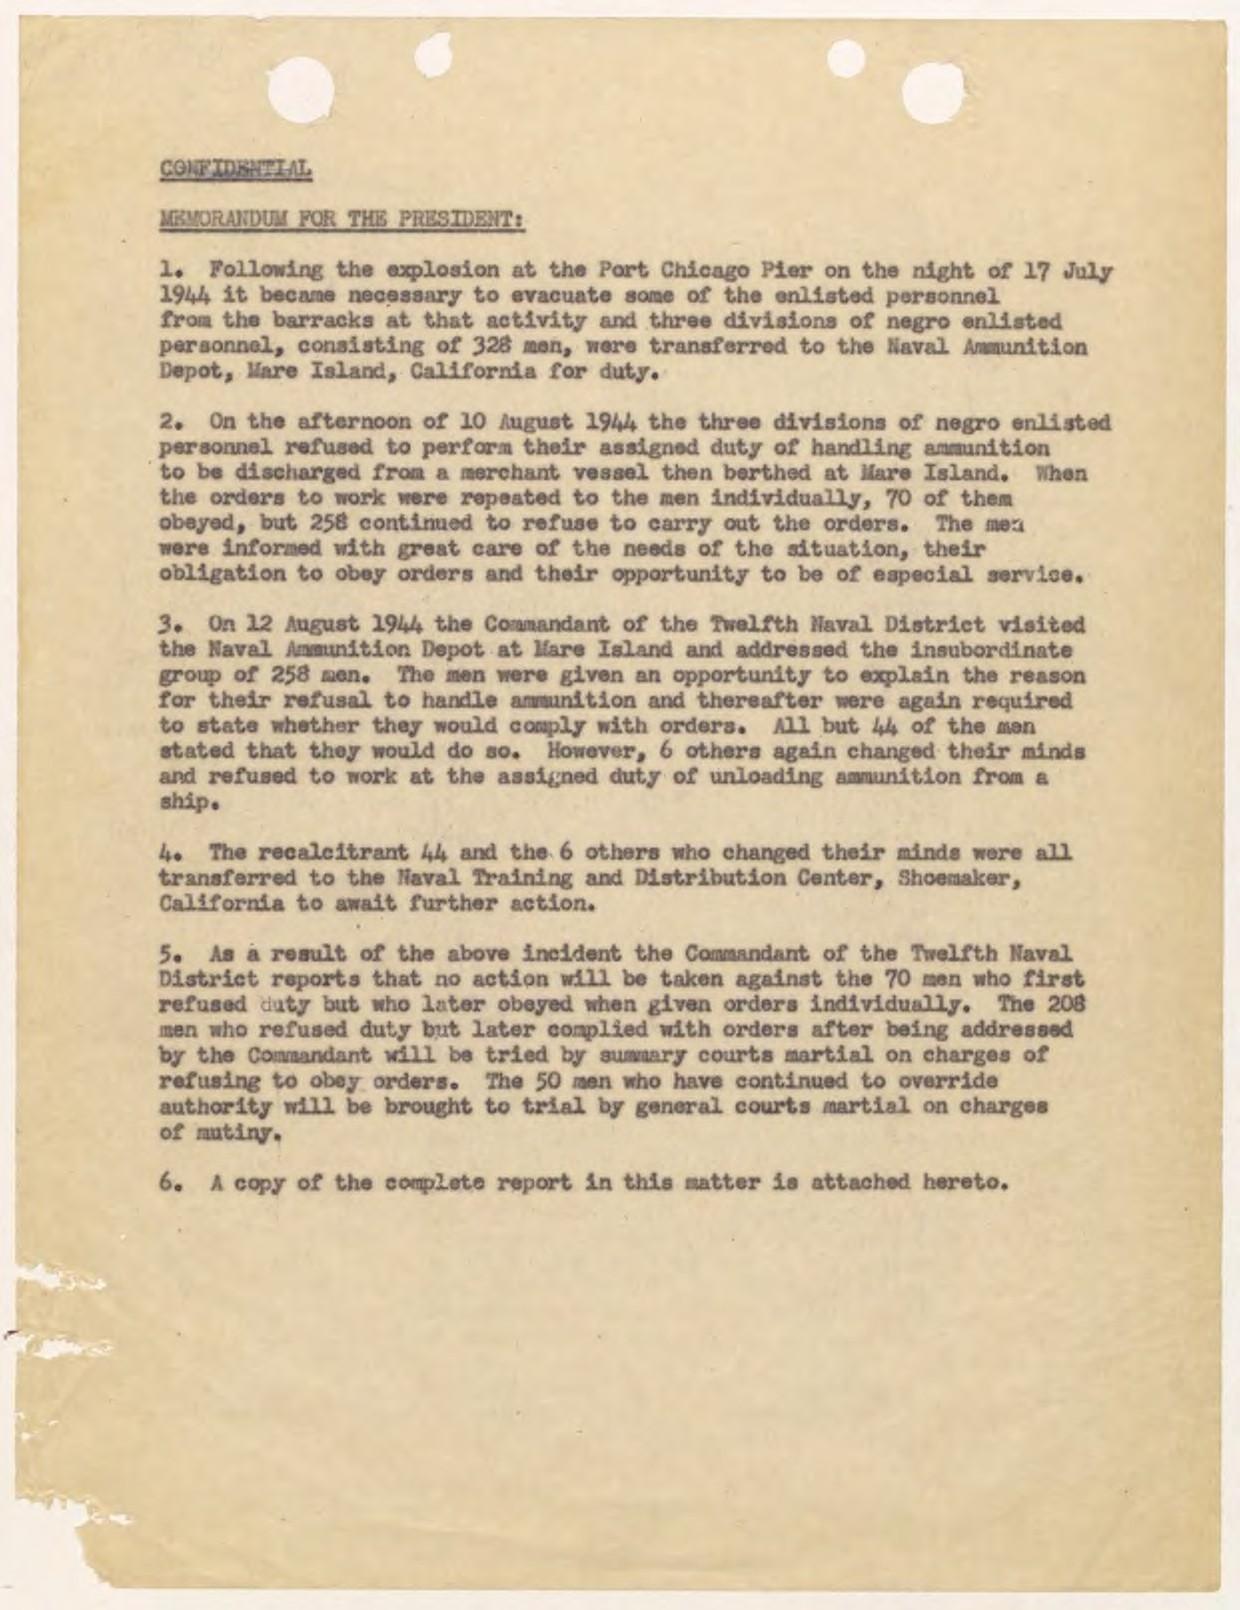 World War II Port Chicago Disaster/Port Chicago Mutiny -  PaperlessArchives.com